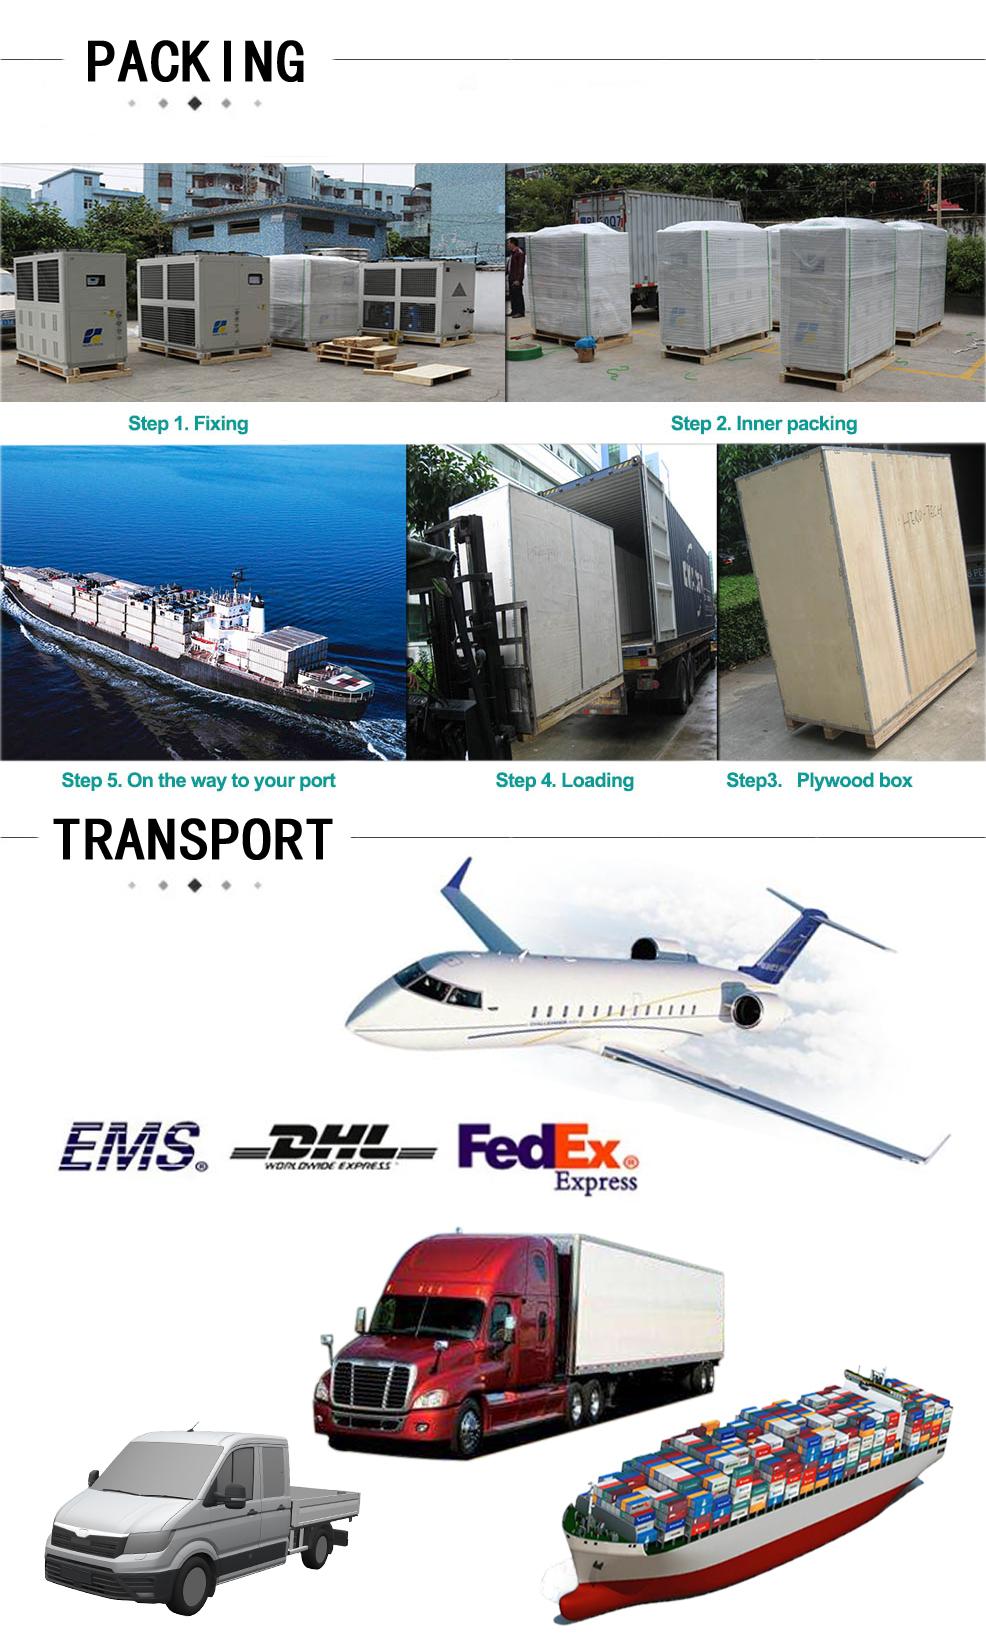 Packing shipment